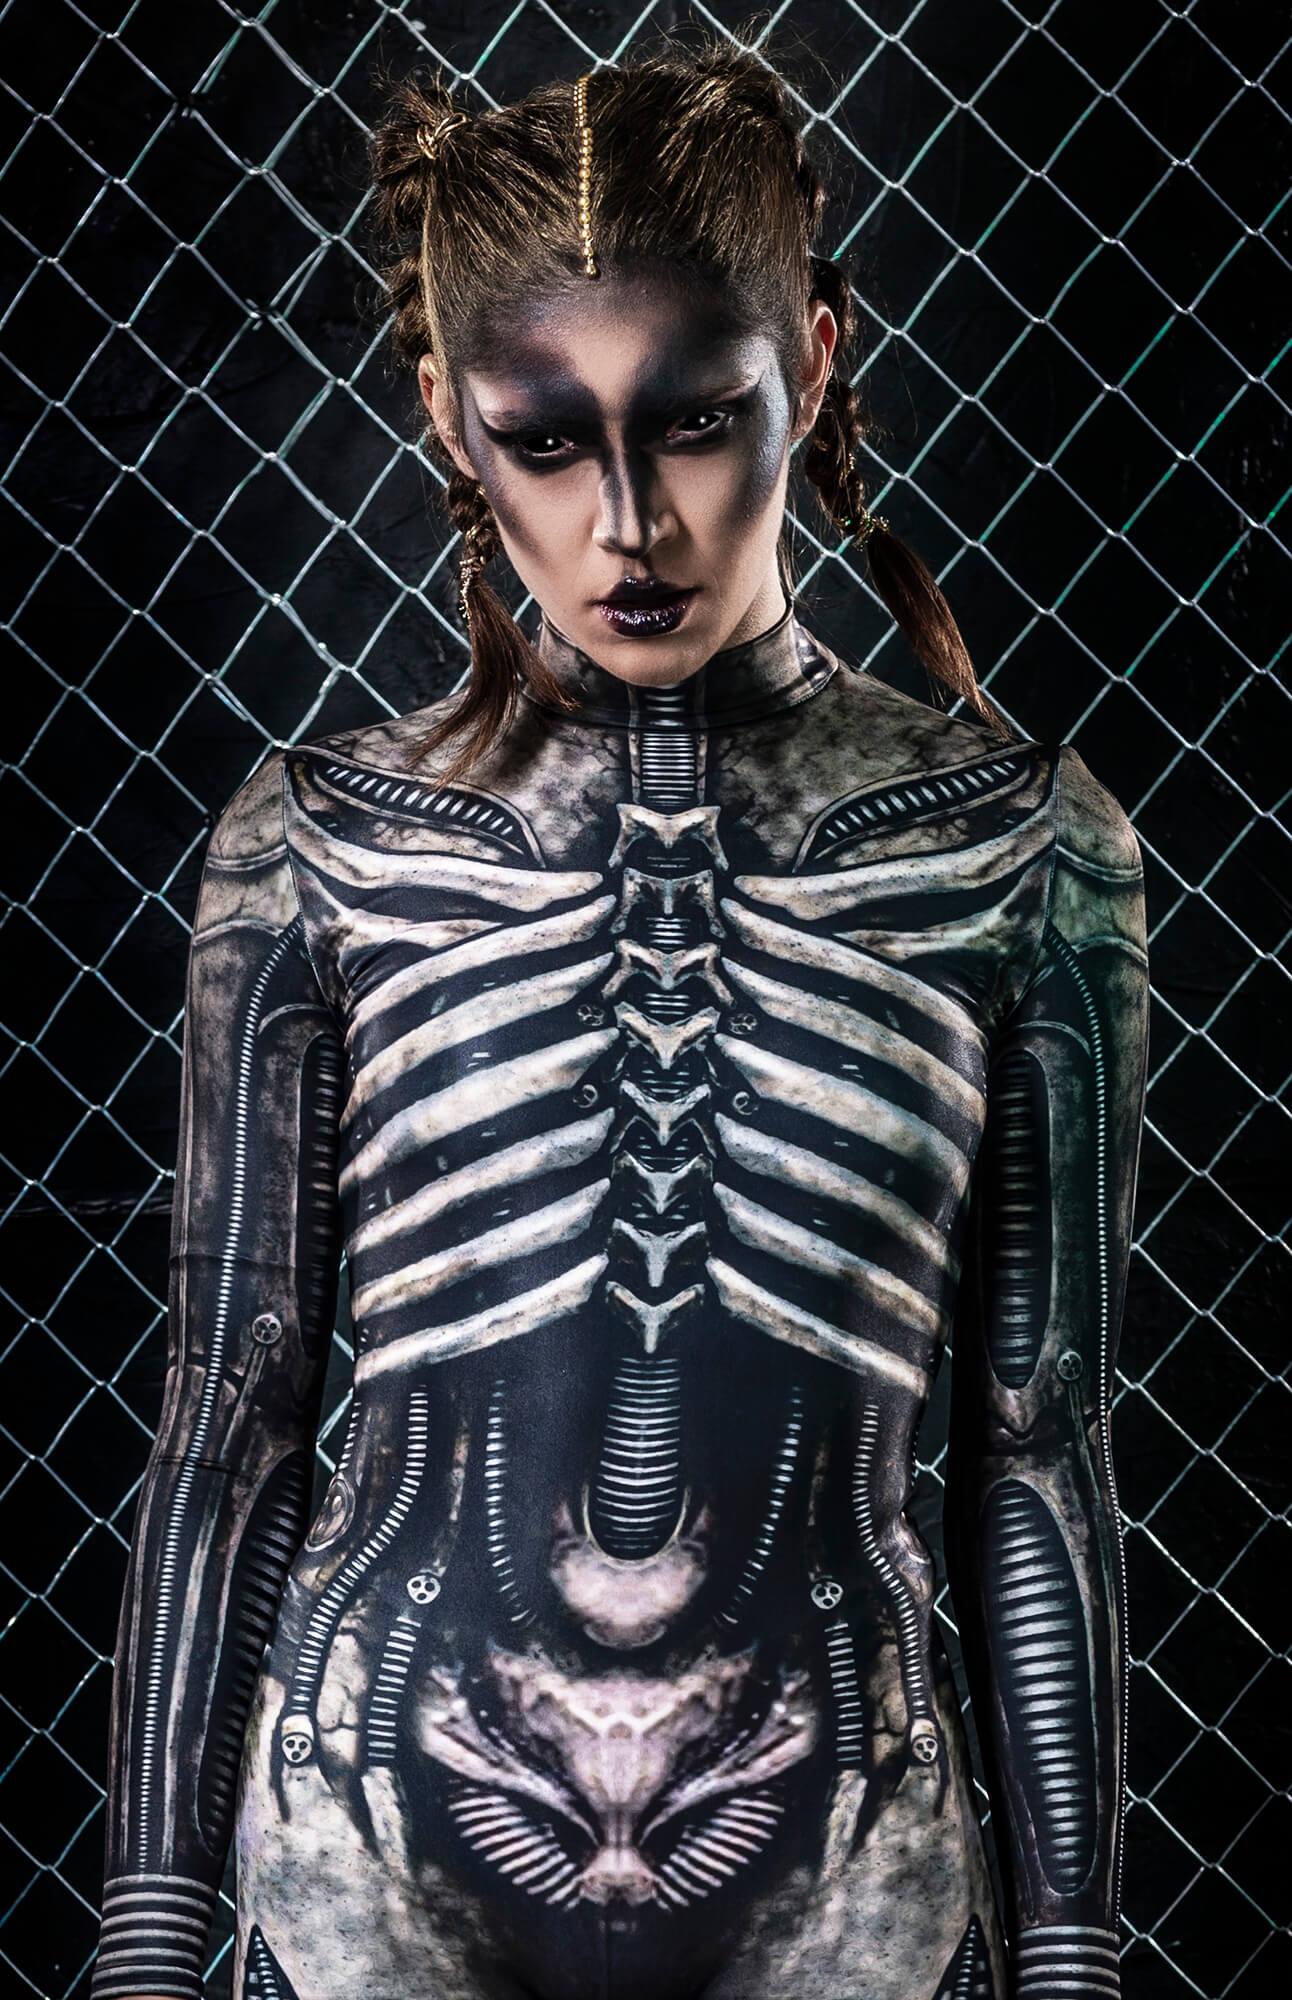 Xenomorph Costume - Rave Clothing Women - Sexy Festival Bodysuit